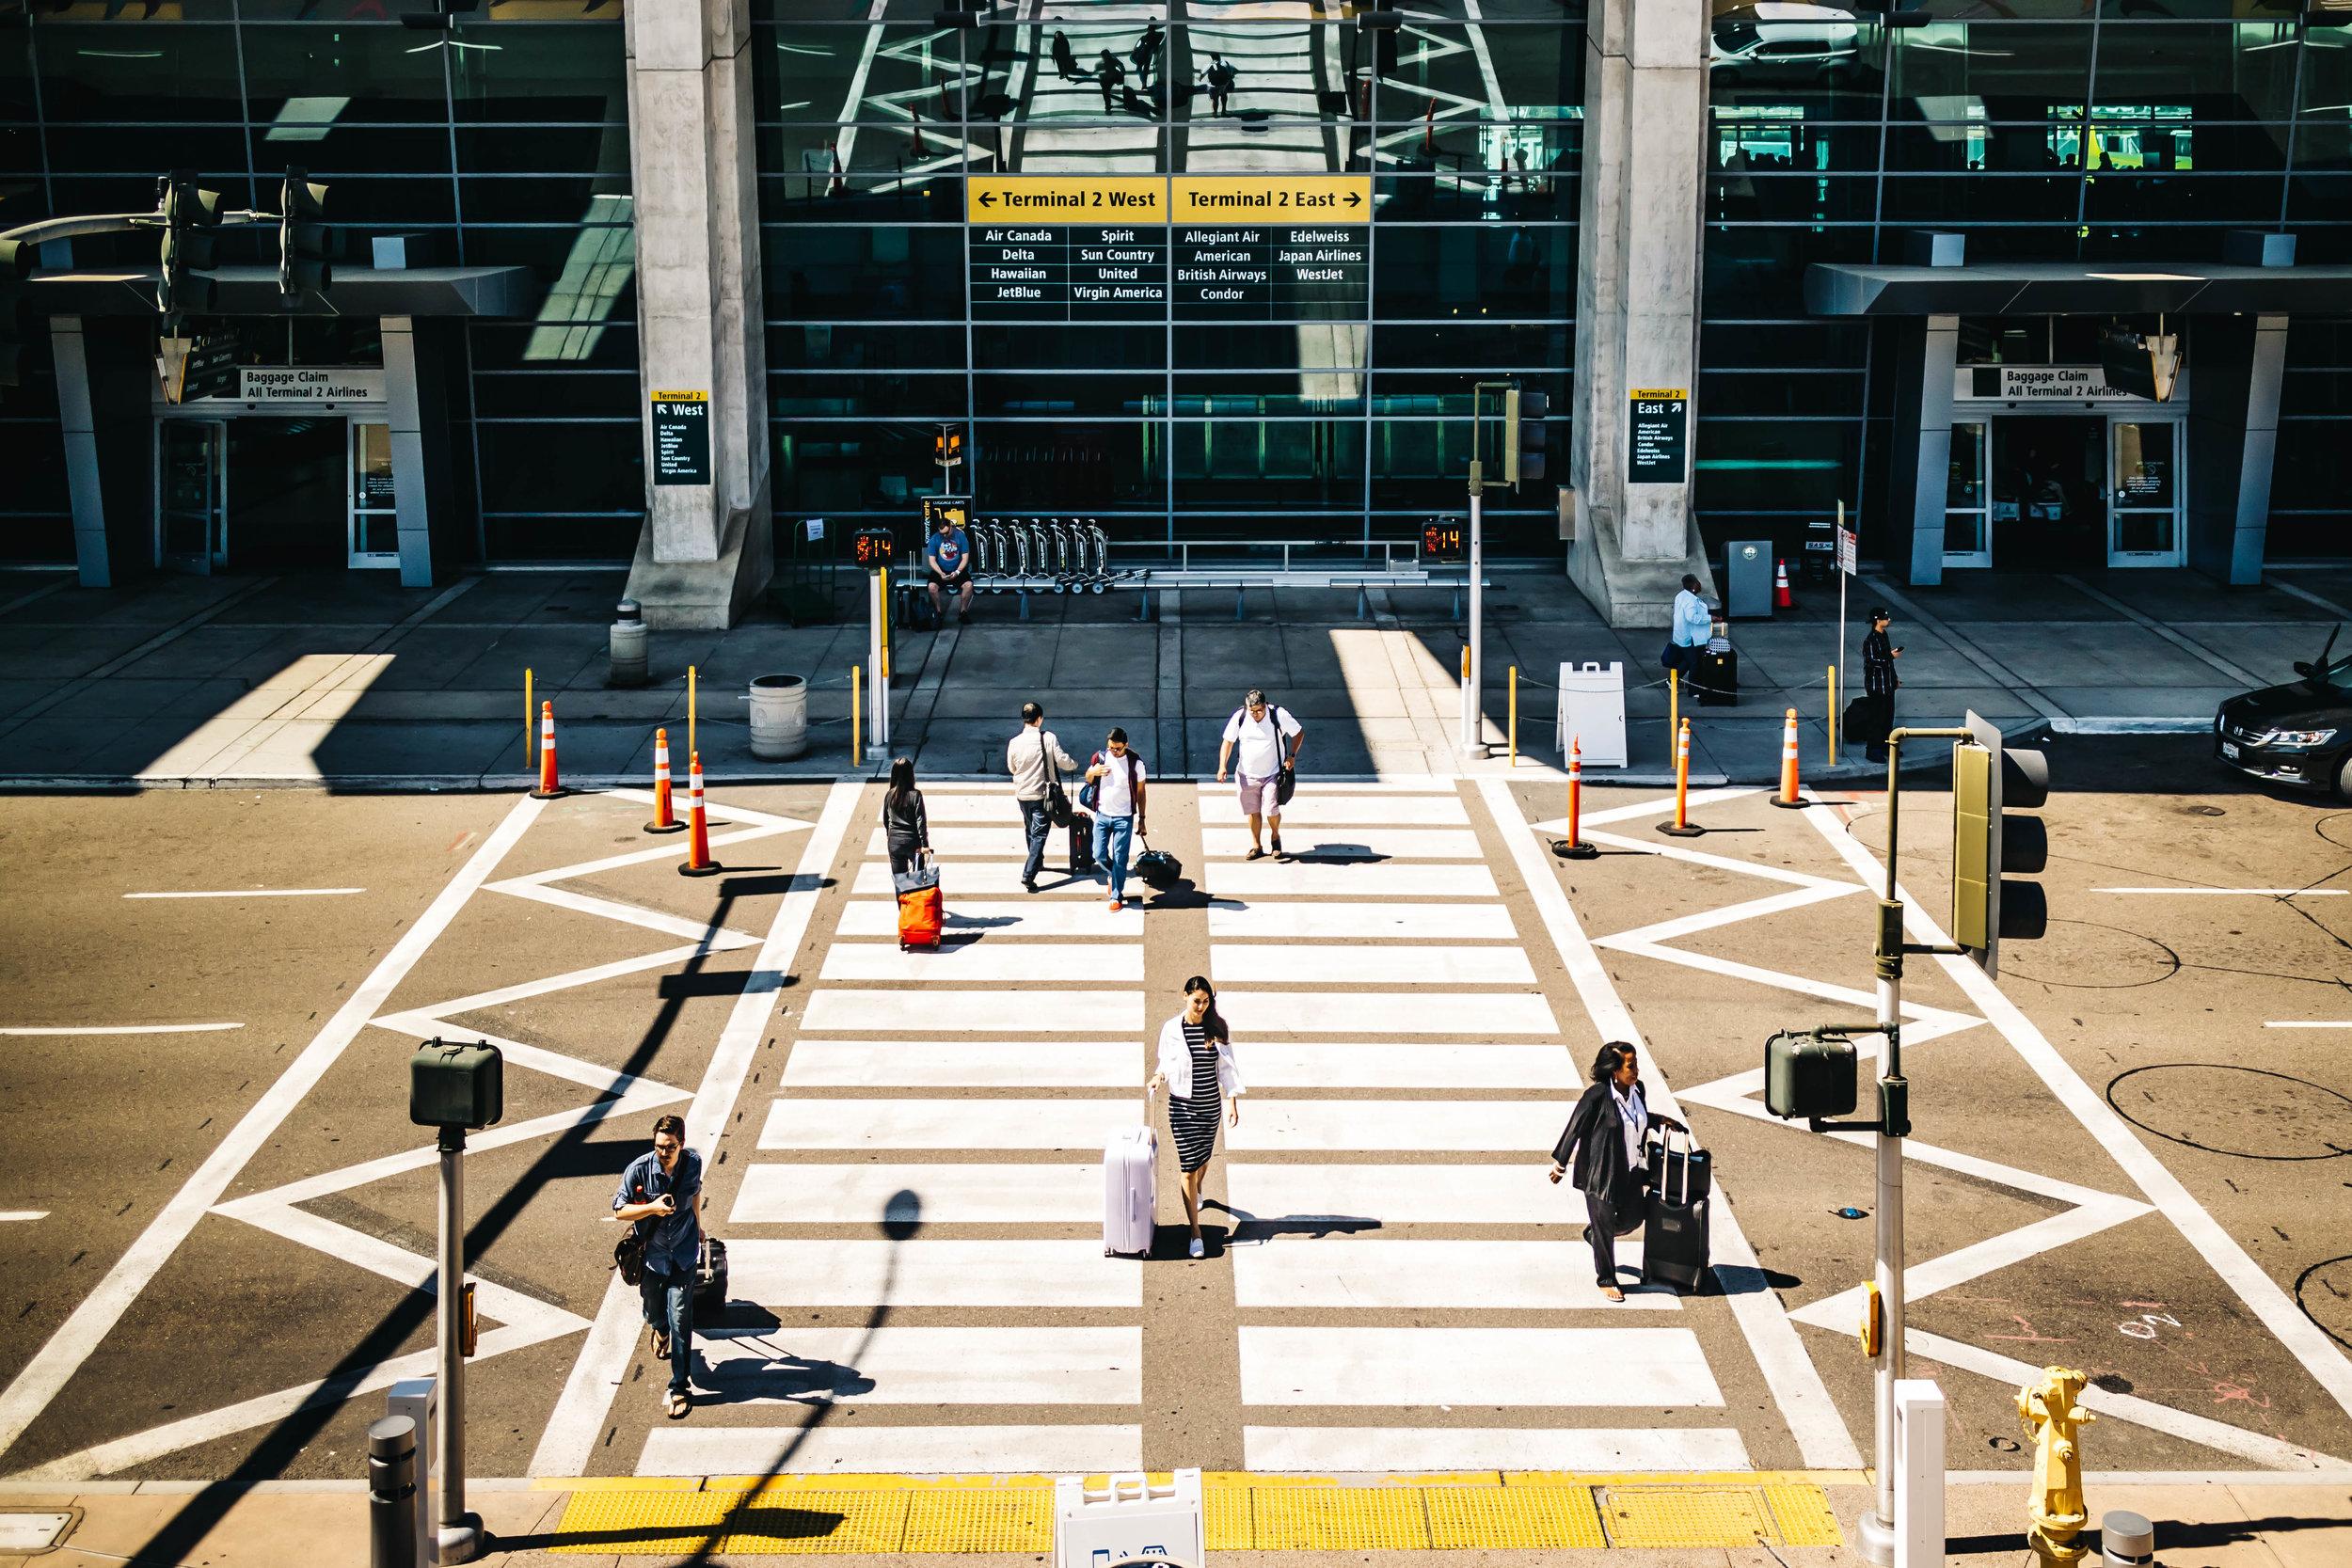 Global Entry vs. TSA Pre-Check + www.thetravelpockets.com